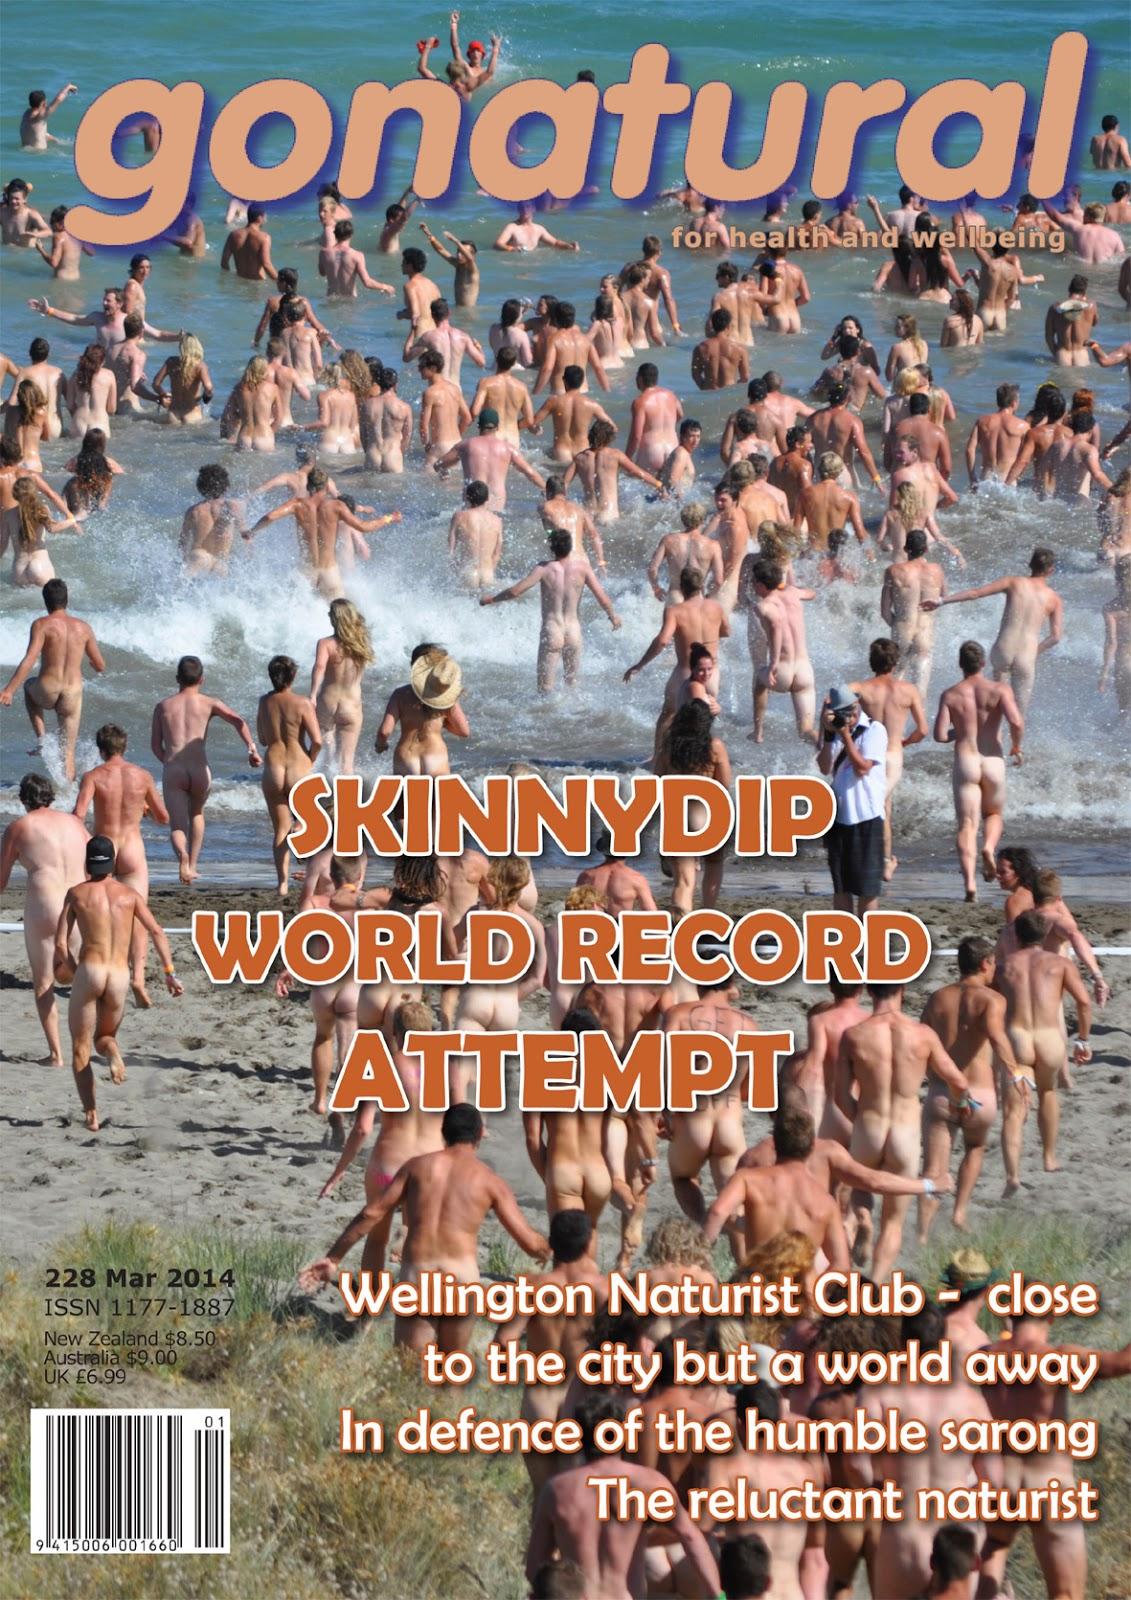 New Zealand Naturist Federation gonatural Magazine Issue 228 March 2014